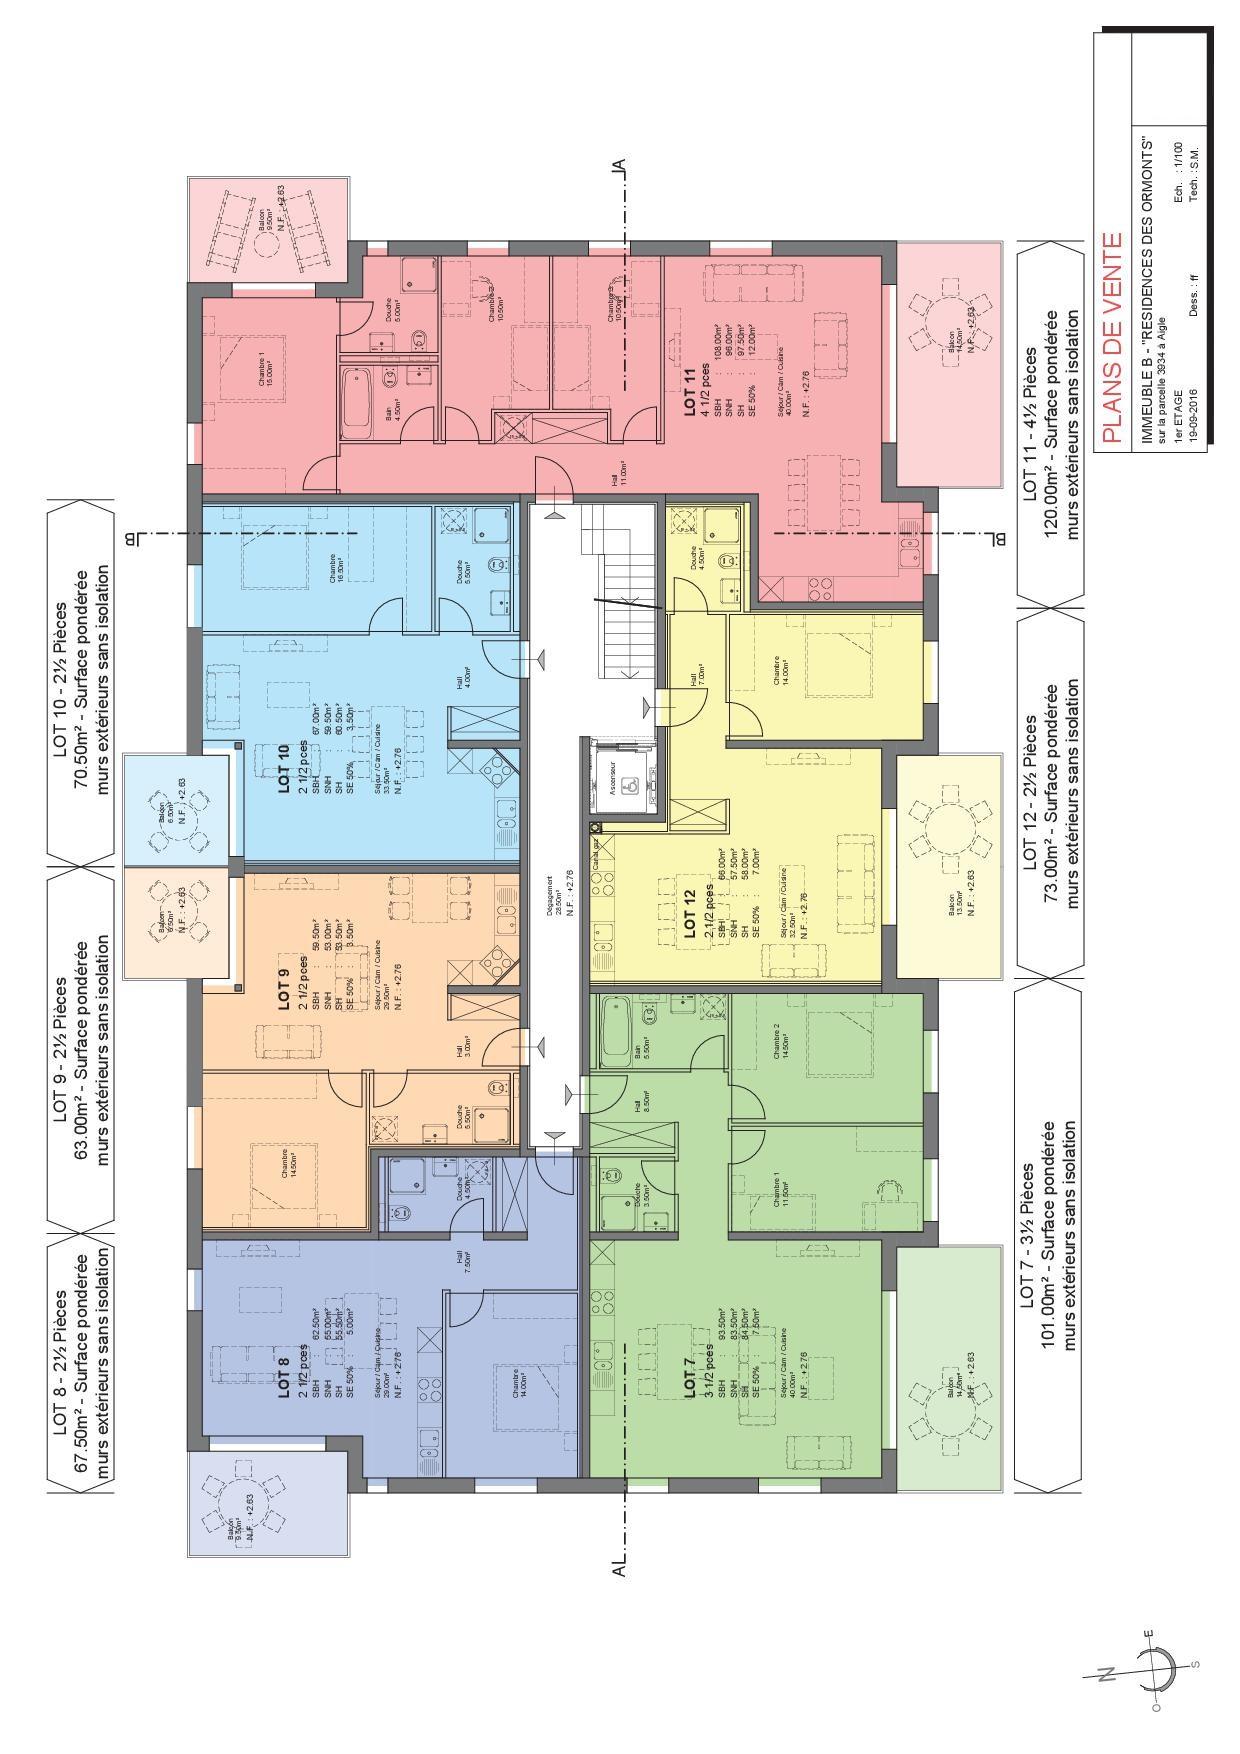 Plan 1er étage (lot 7 à 12)